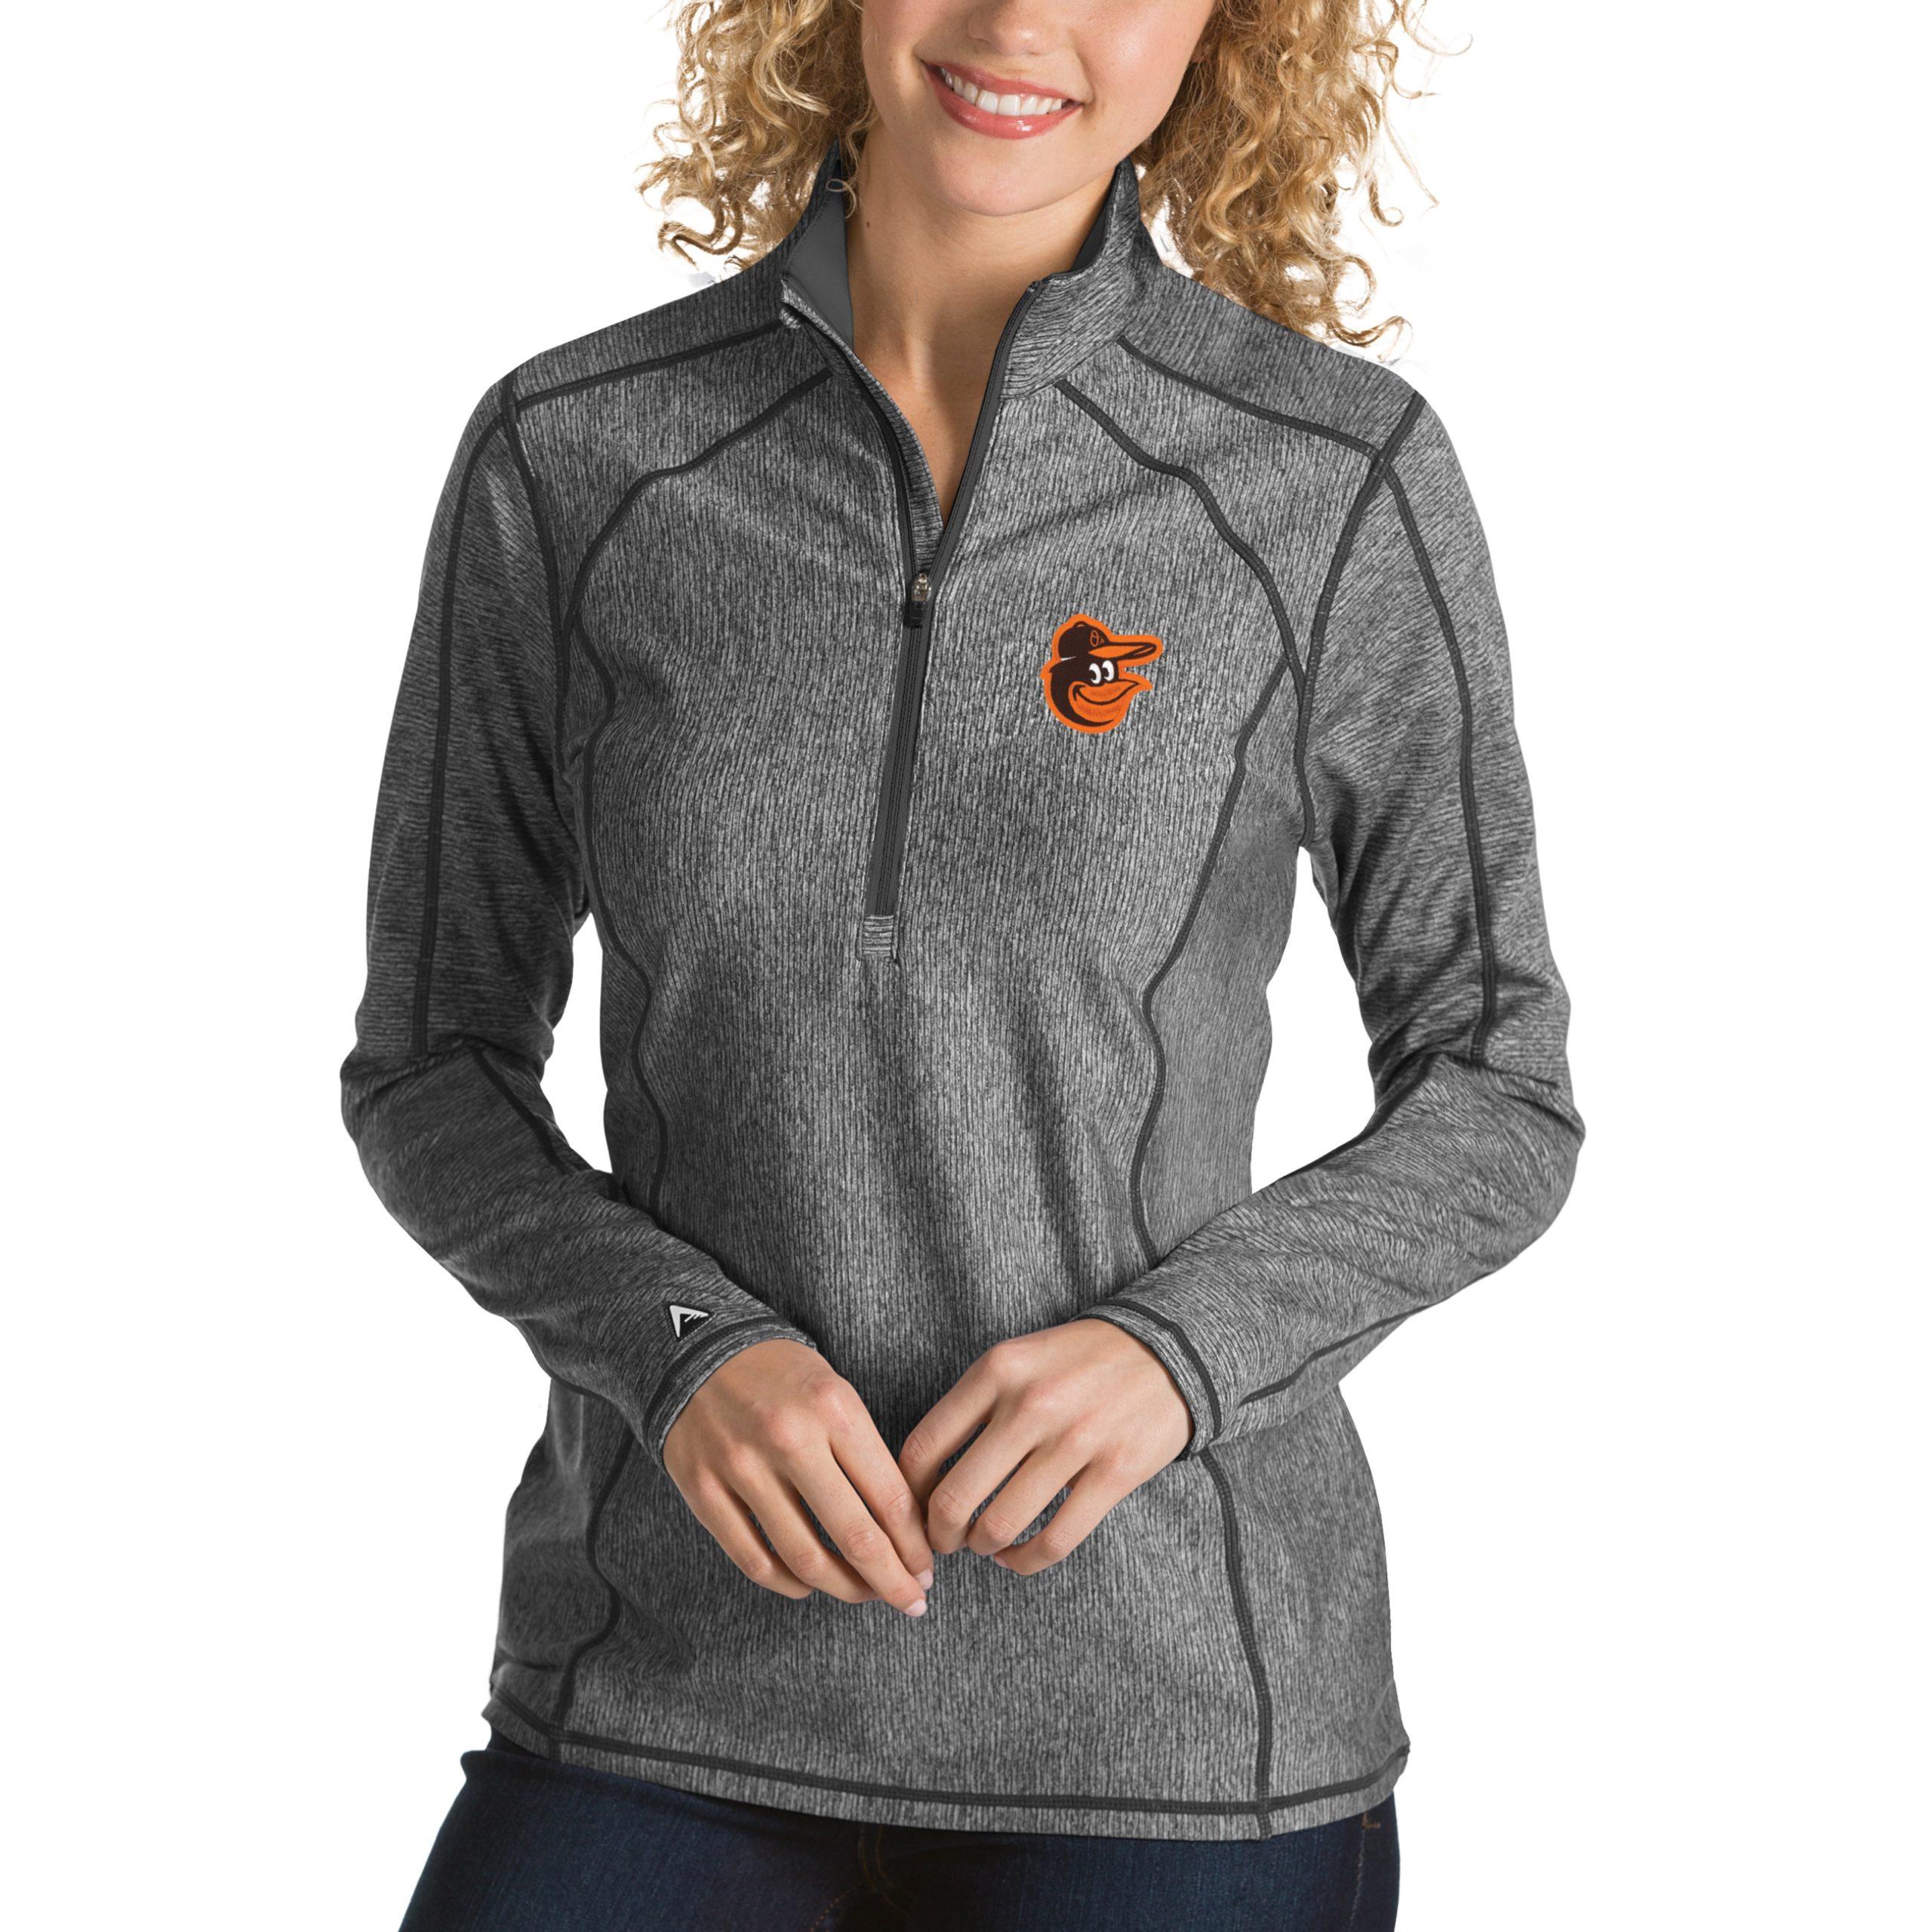 Baltimore Orioles Antigua Women's Tempo Desert Dry 1/4-Zip Pullover Jacket - Heathered Charcoal